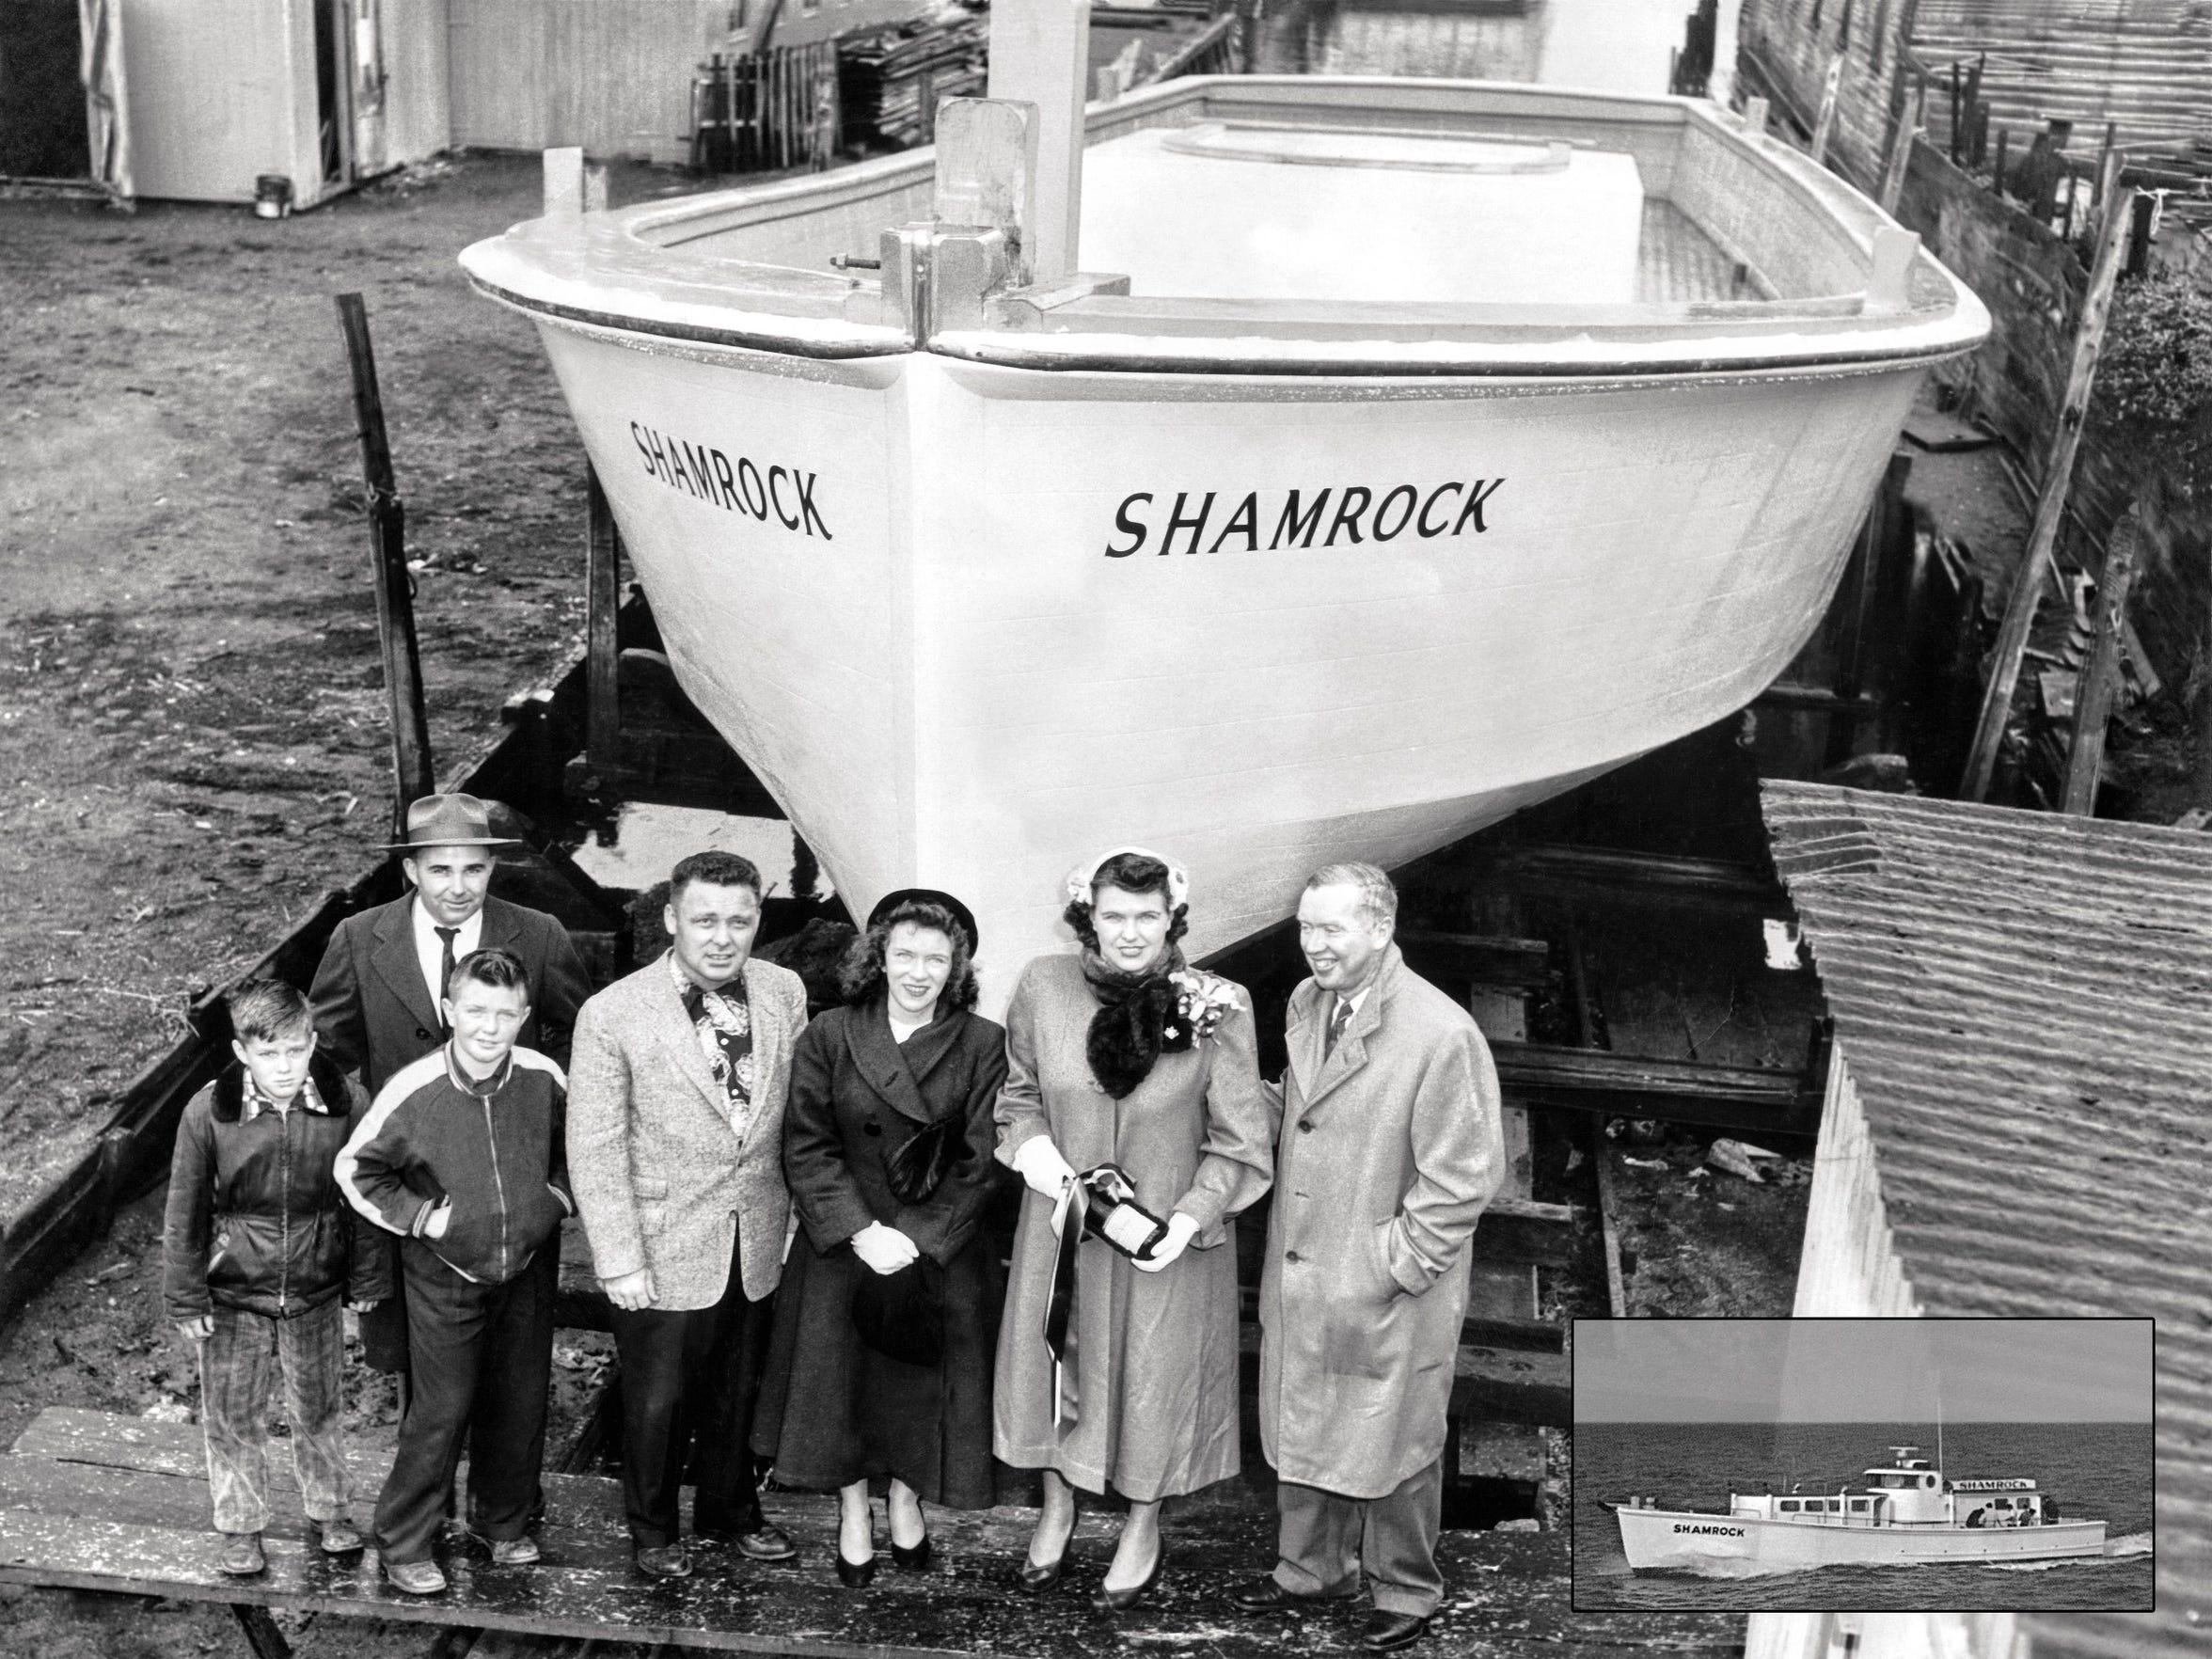 948 - SHAMROCK Hull Launch 1953 (Edited Collage)